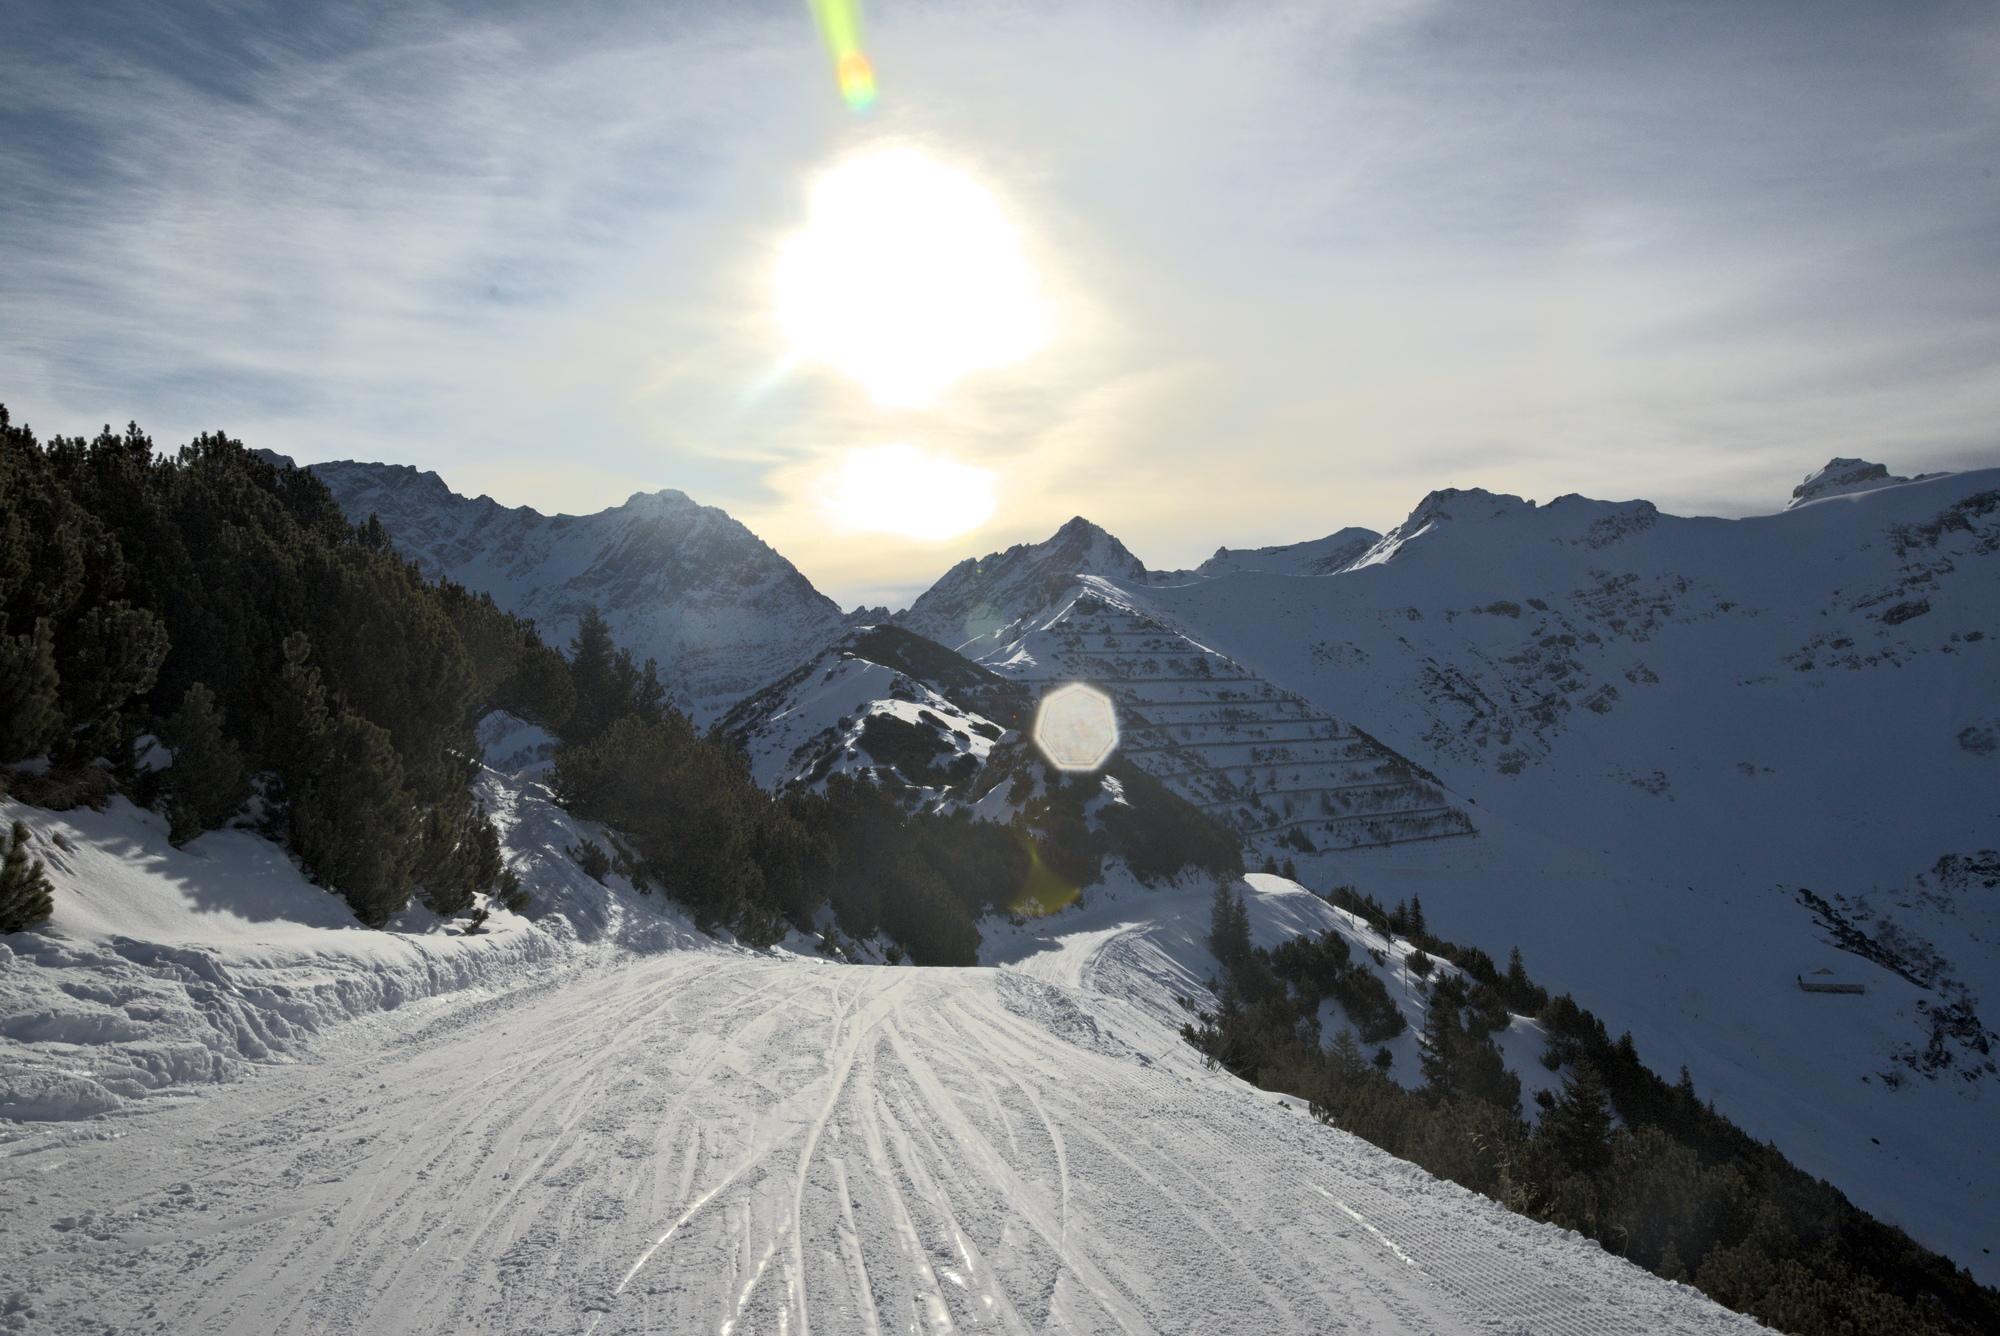 ski-scene-rawconvert